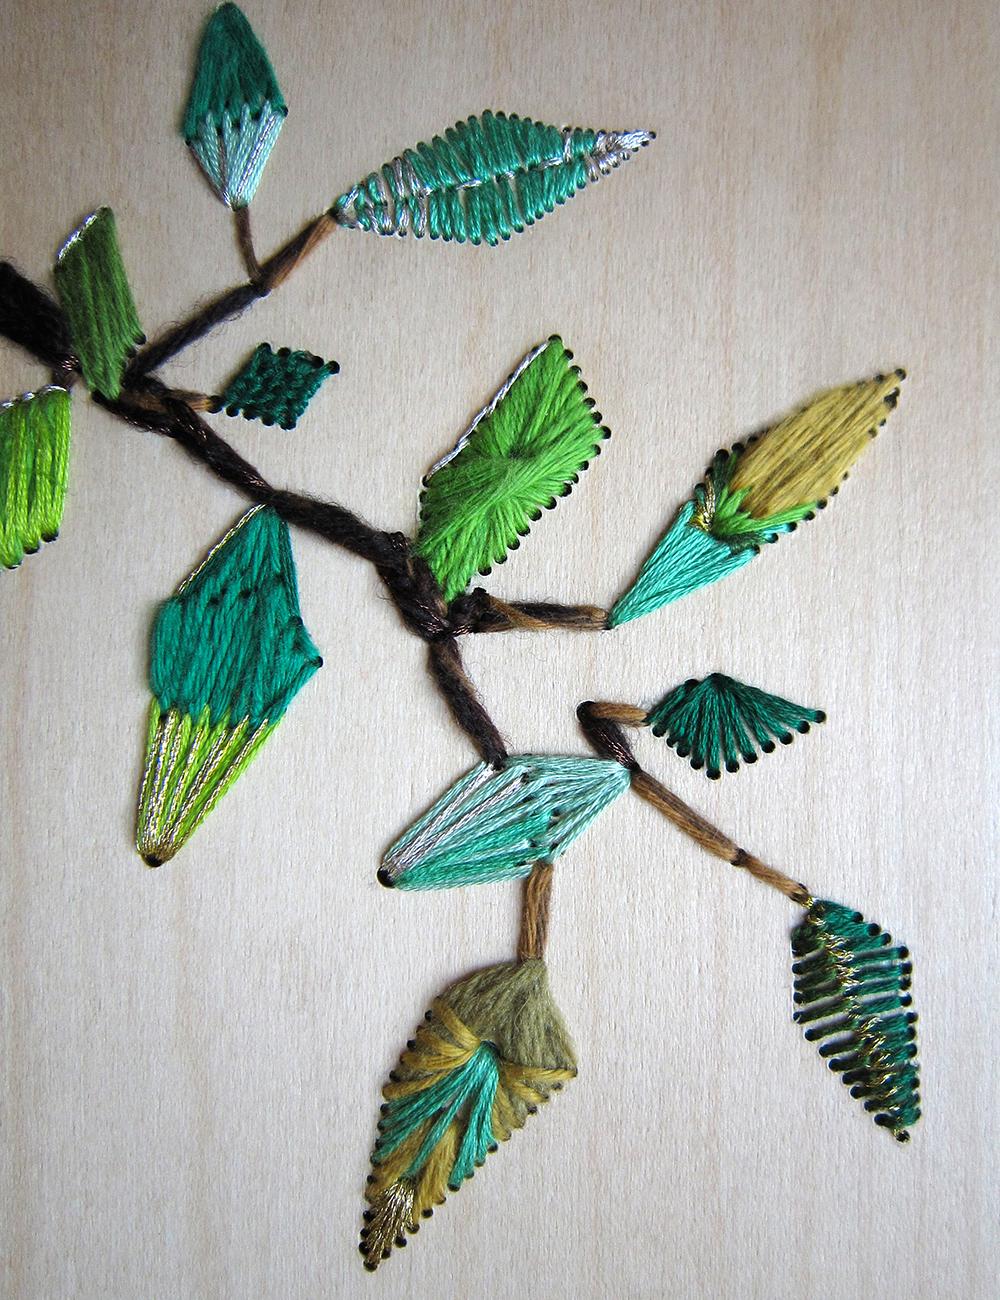 aurelie wozniak creatrice plasticienne artiste designer broderie sur bois arborescence hetraie. Black Bedroom Furniture Sets. Home Design Ideas